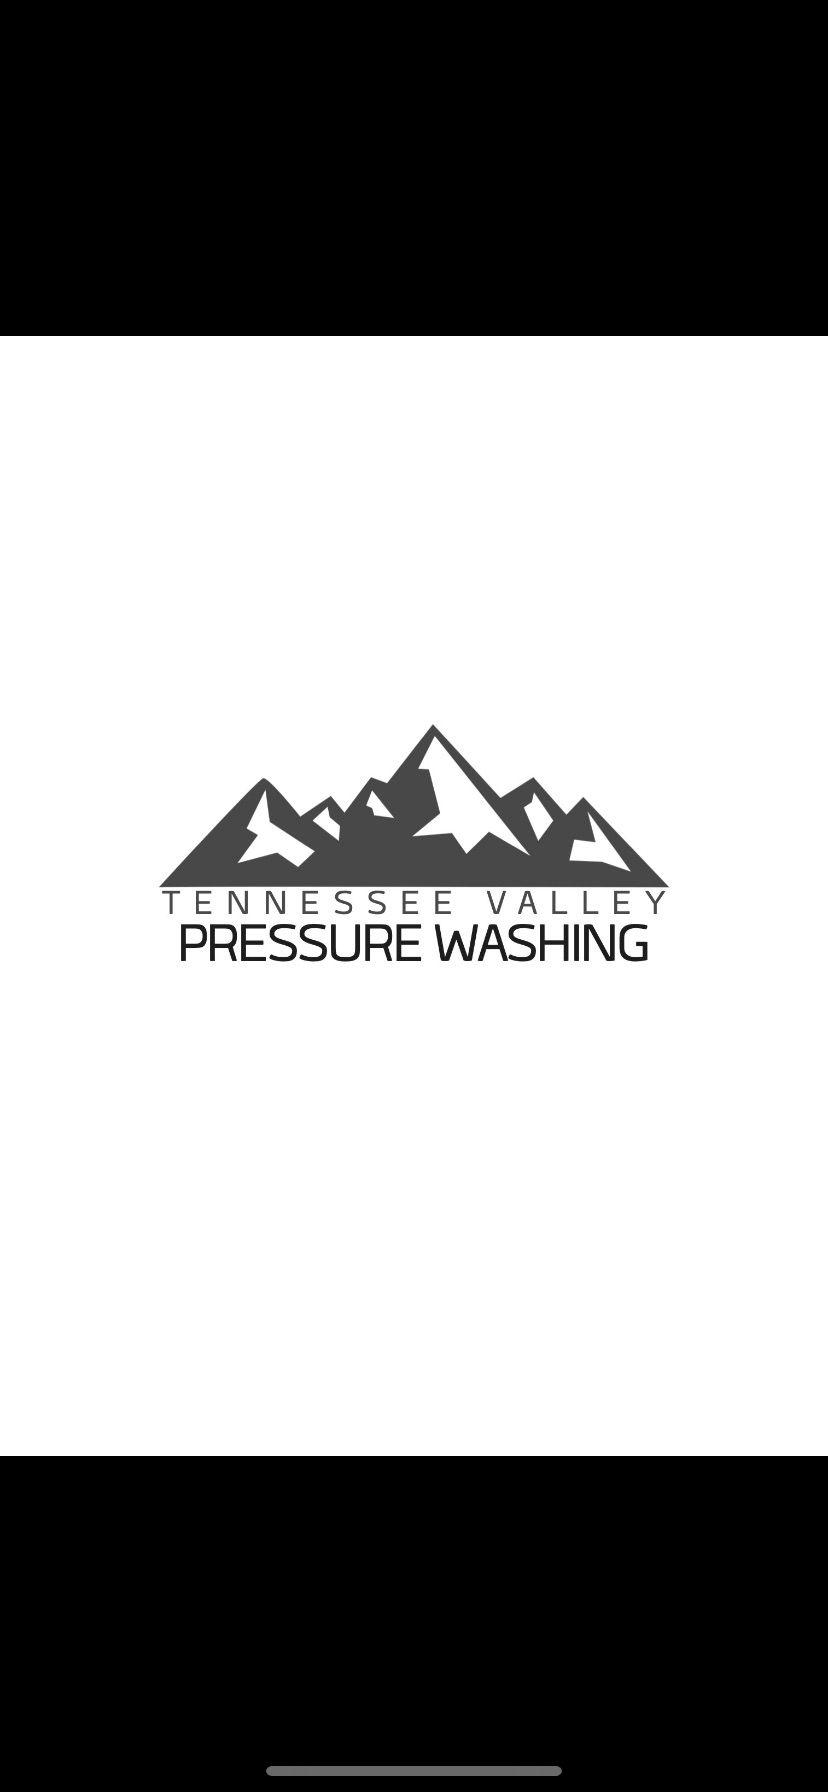 Tennessee Valley Pressure Washing